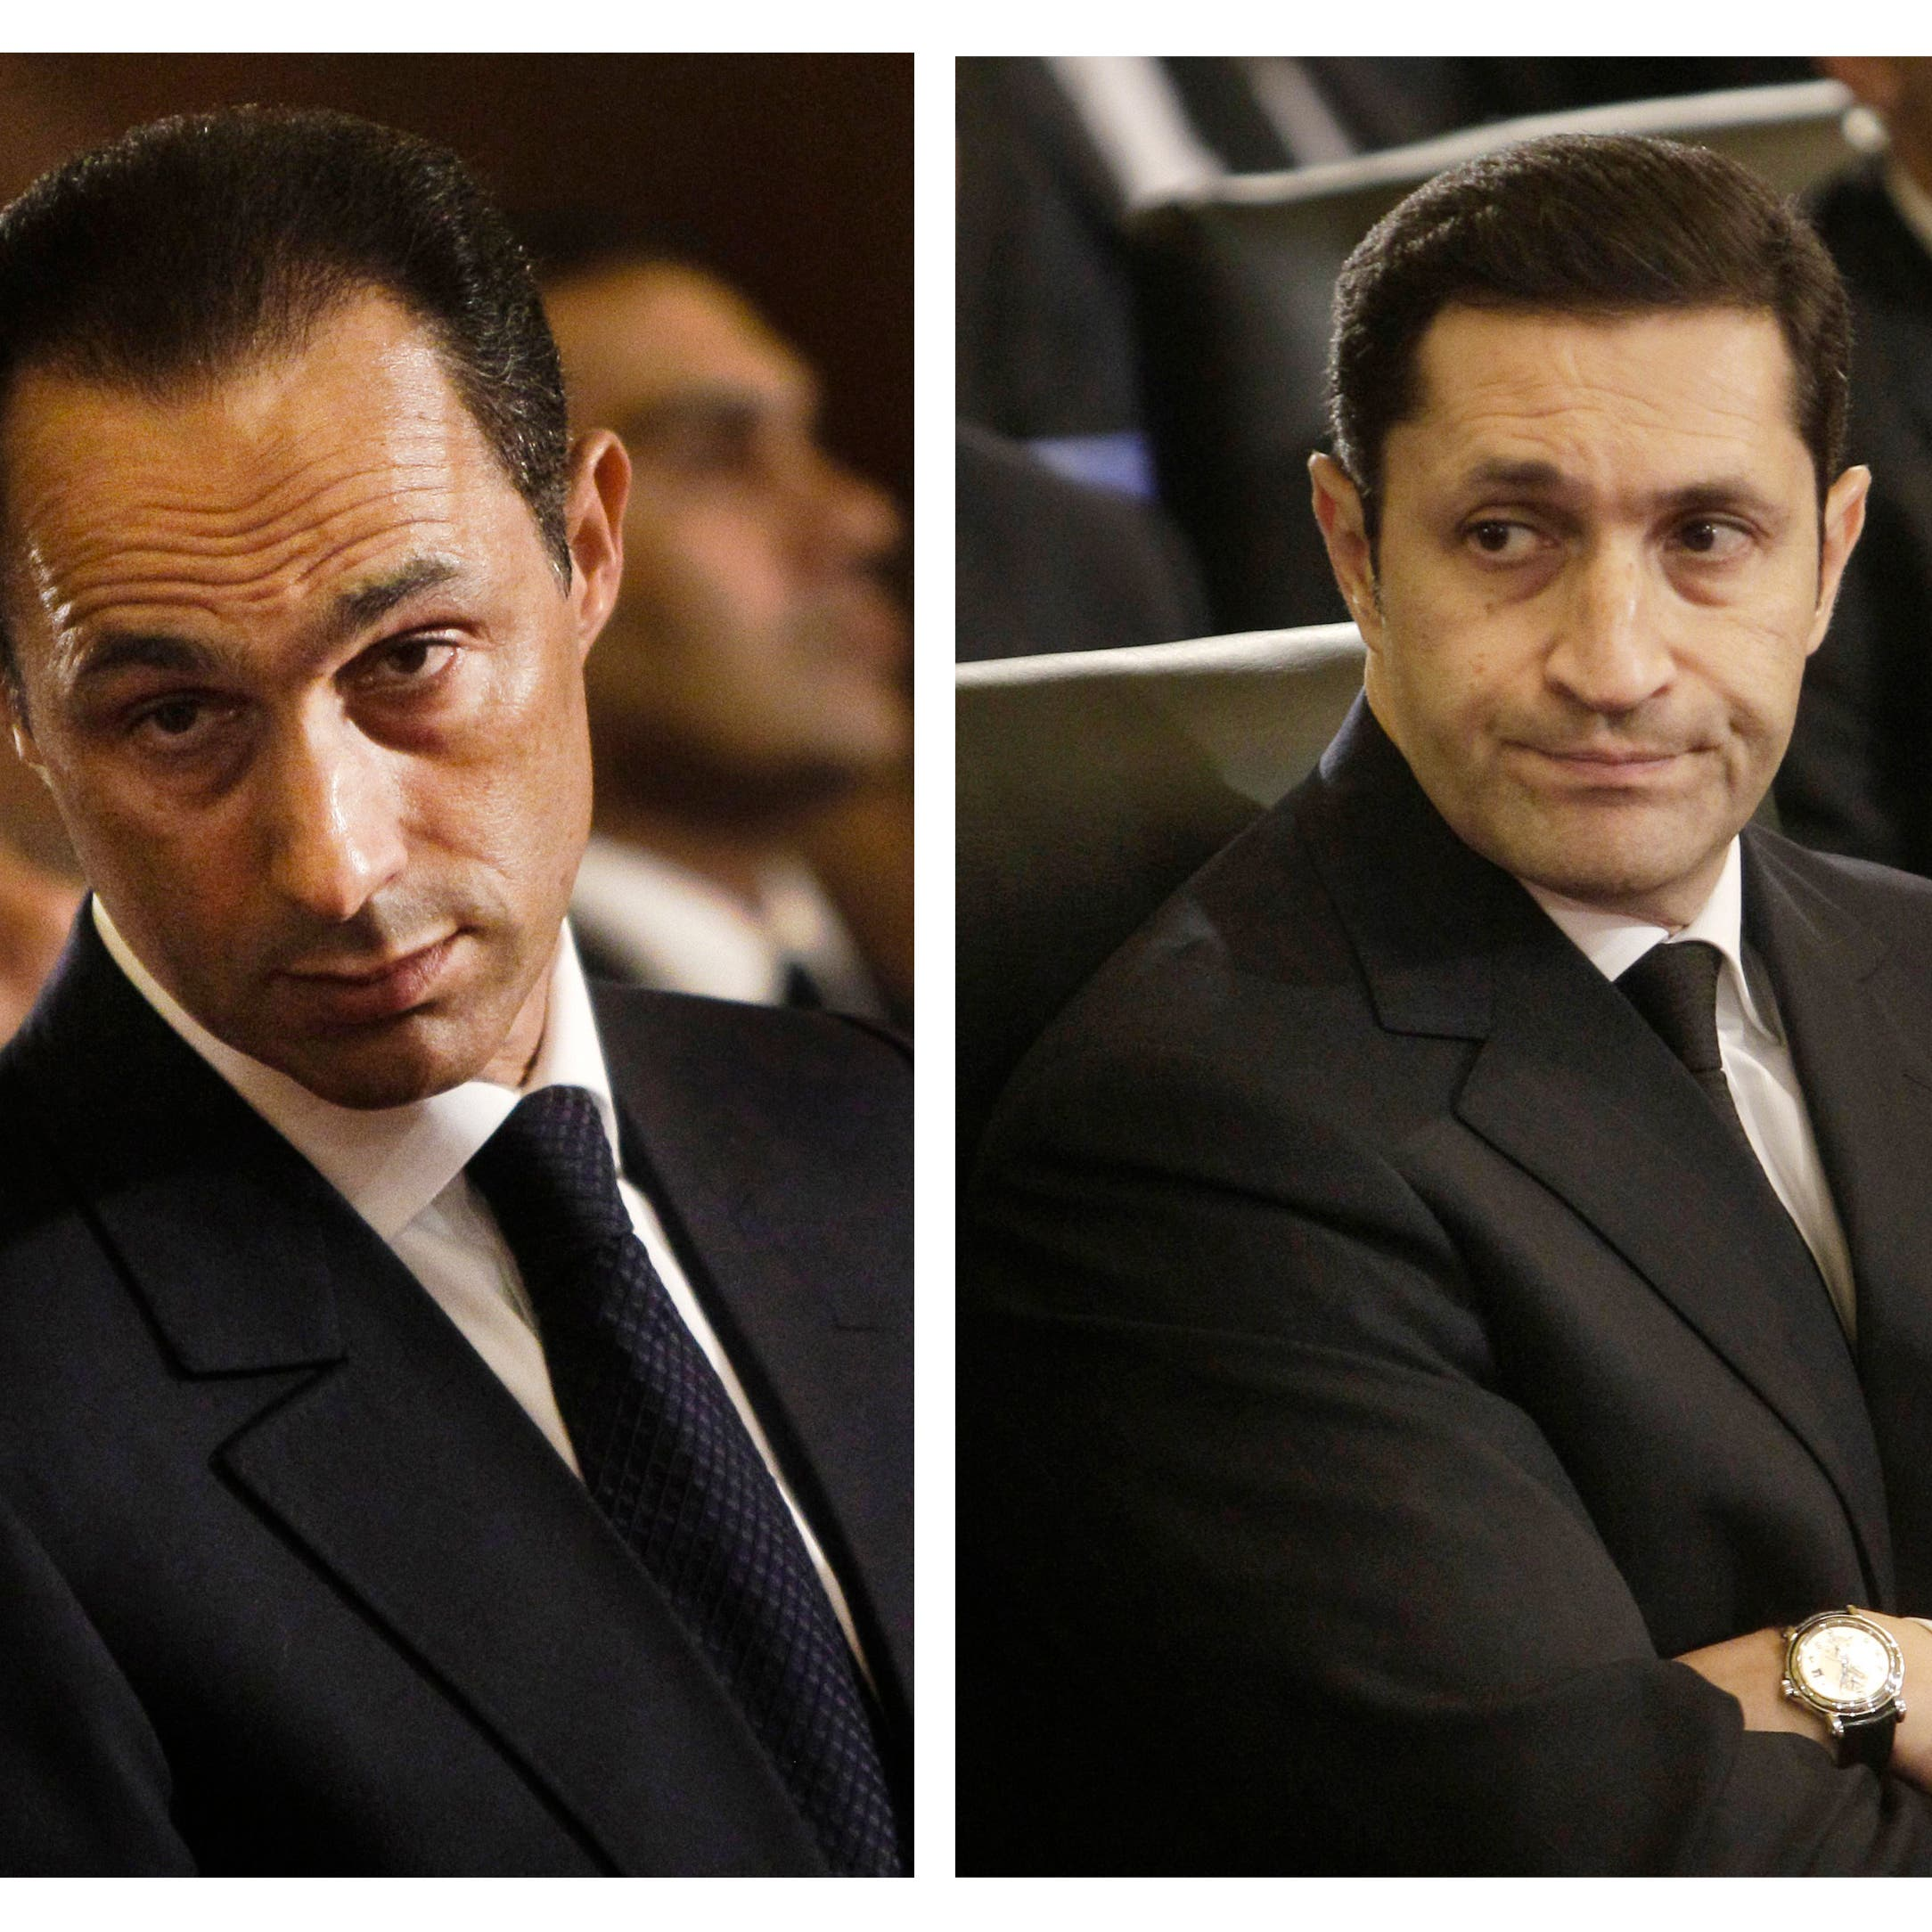 Egypt's endless saga: What next for Hosni Mubarak's sons?